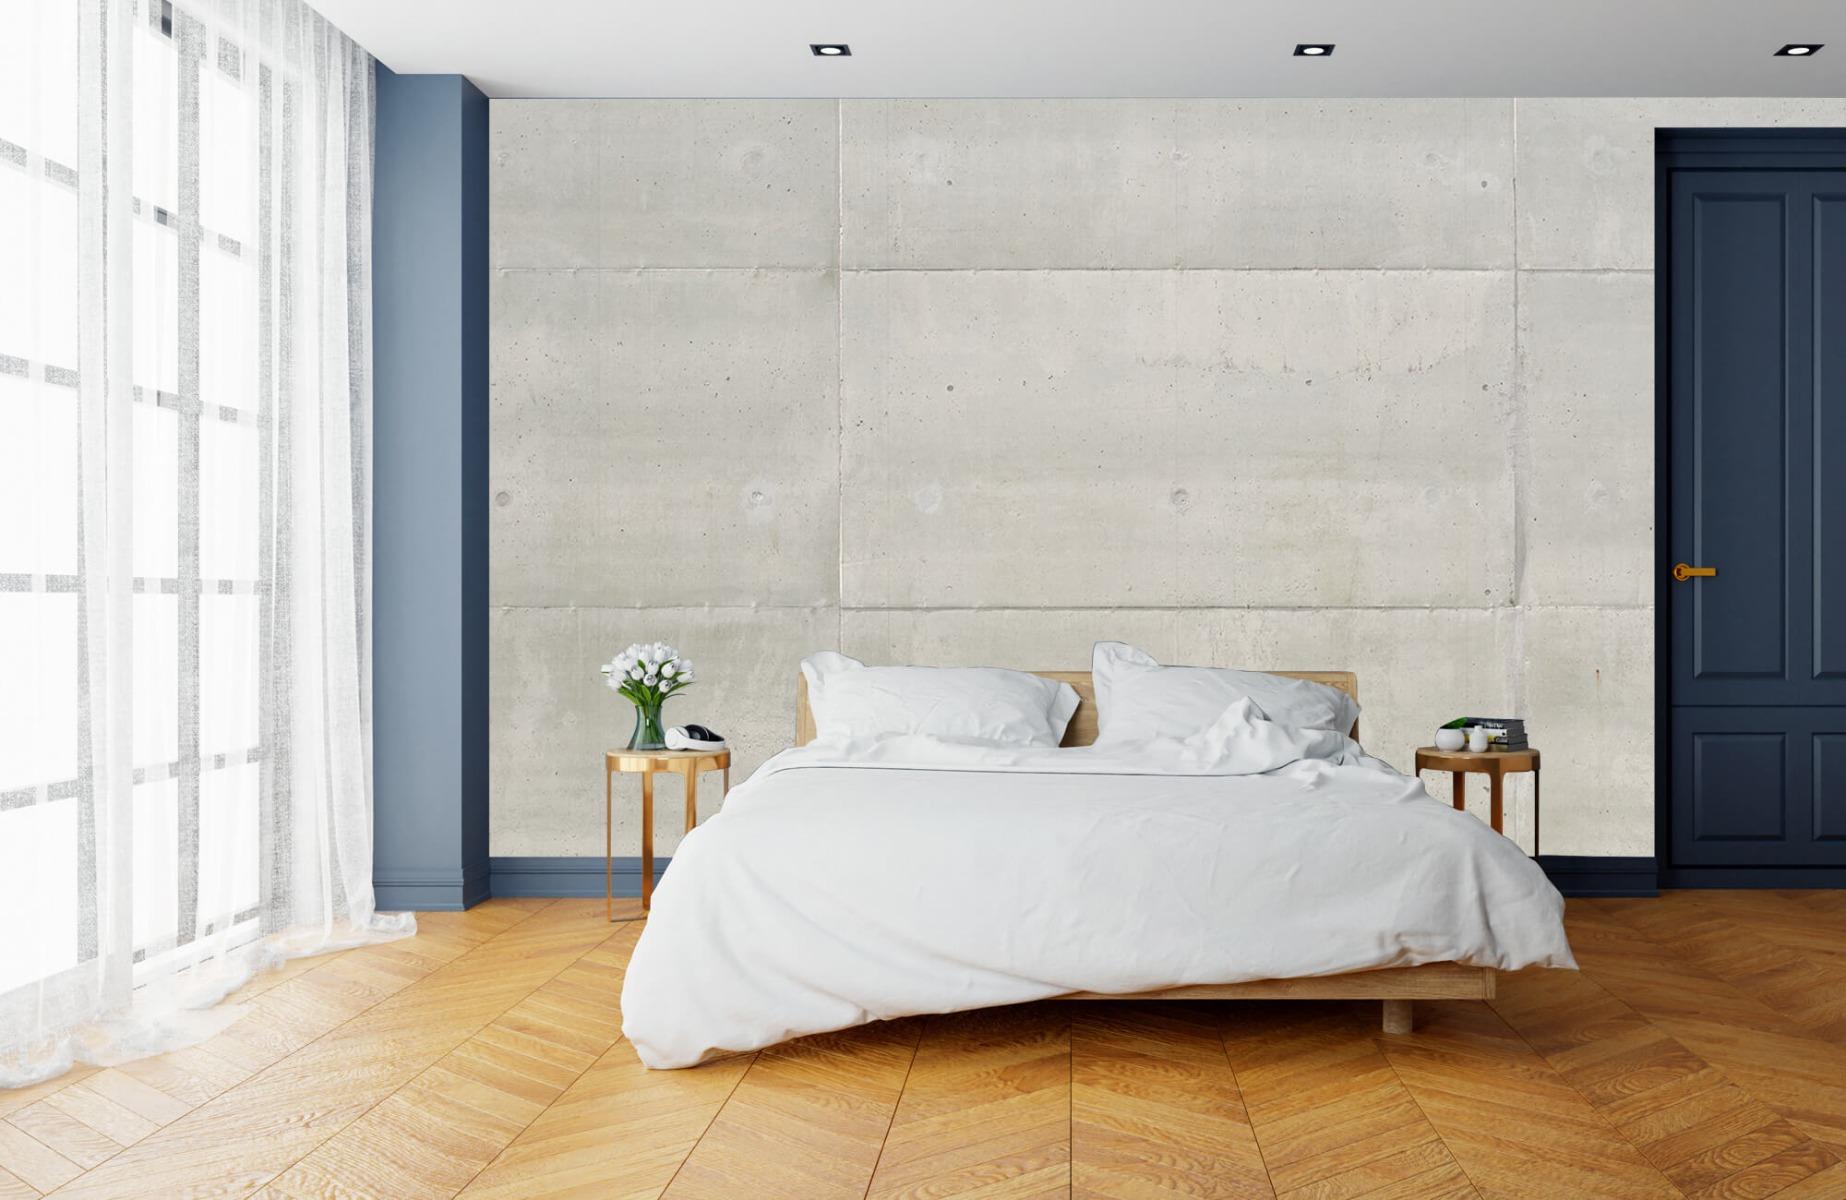 Betonlook behang - Betonnen platen - Wallexclusive - Vergaderruimte 3